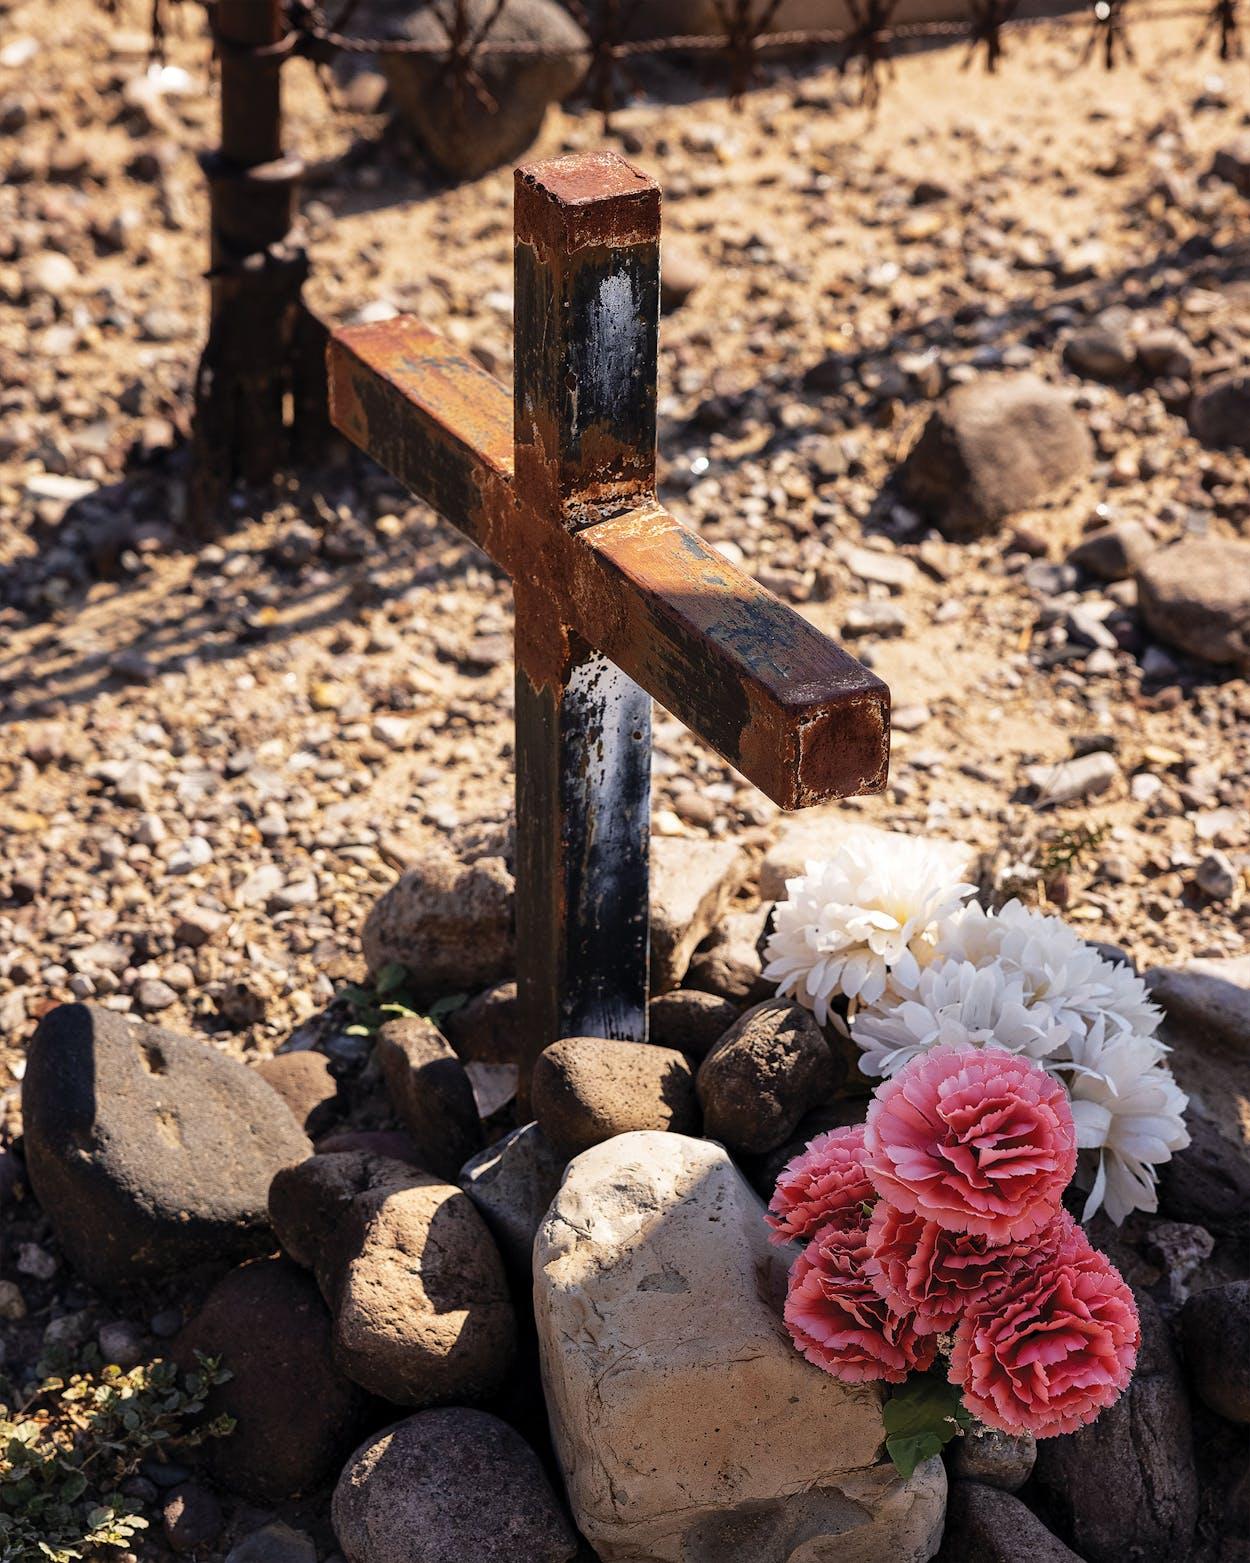 One of two metal crosses in the Cementerio del Barrio de los Lipanes, in Presidio.